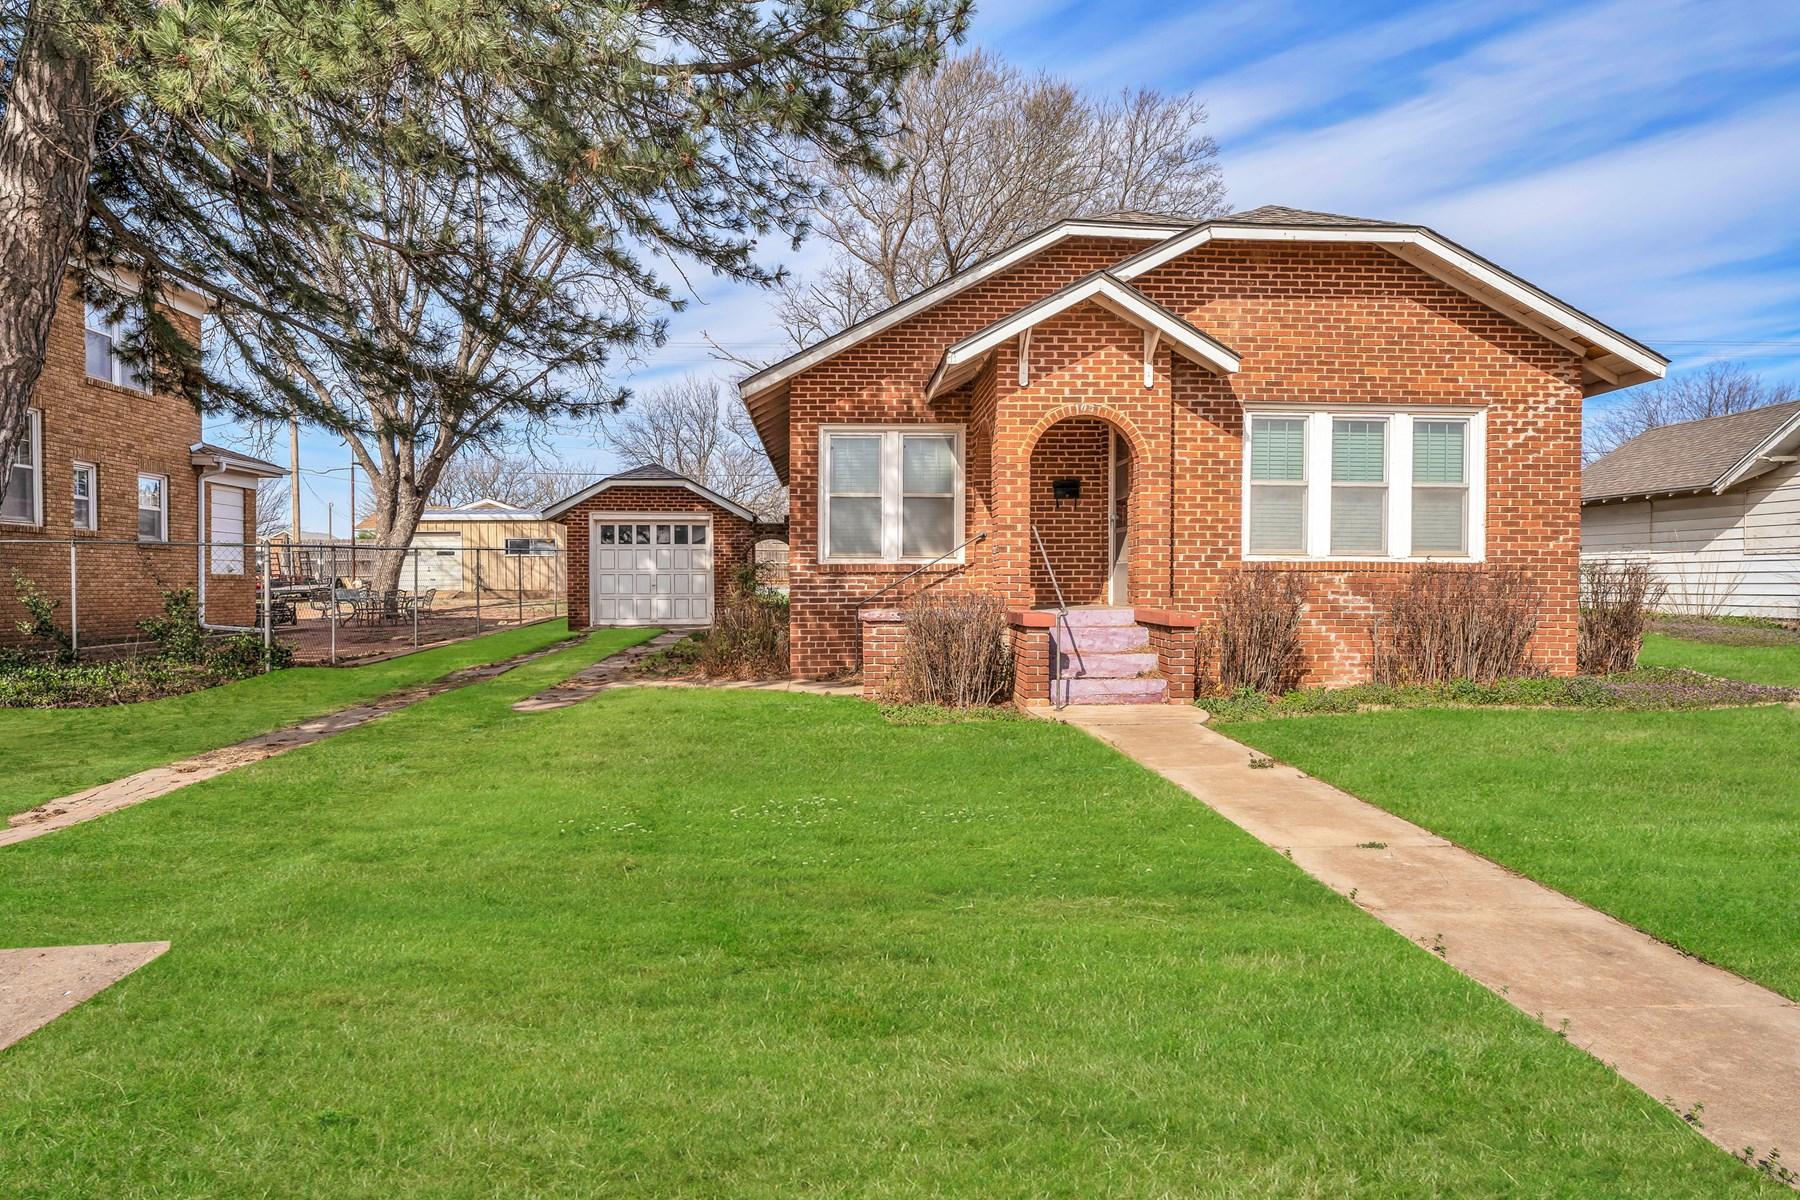 1005 N 4th Street, Sayre, Oklahoma 73662